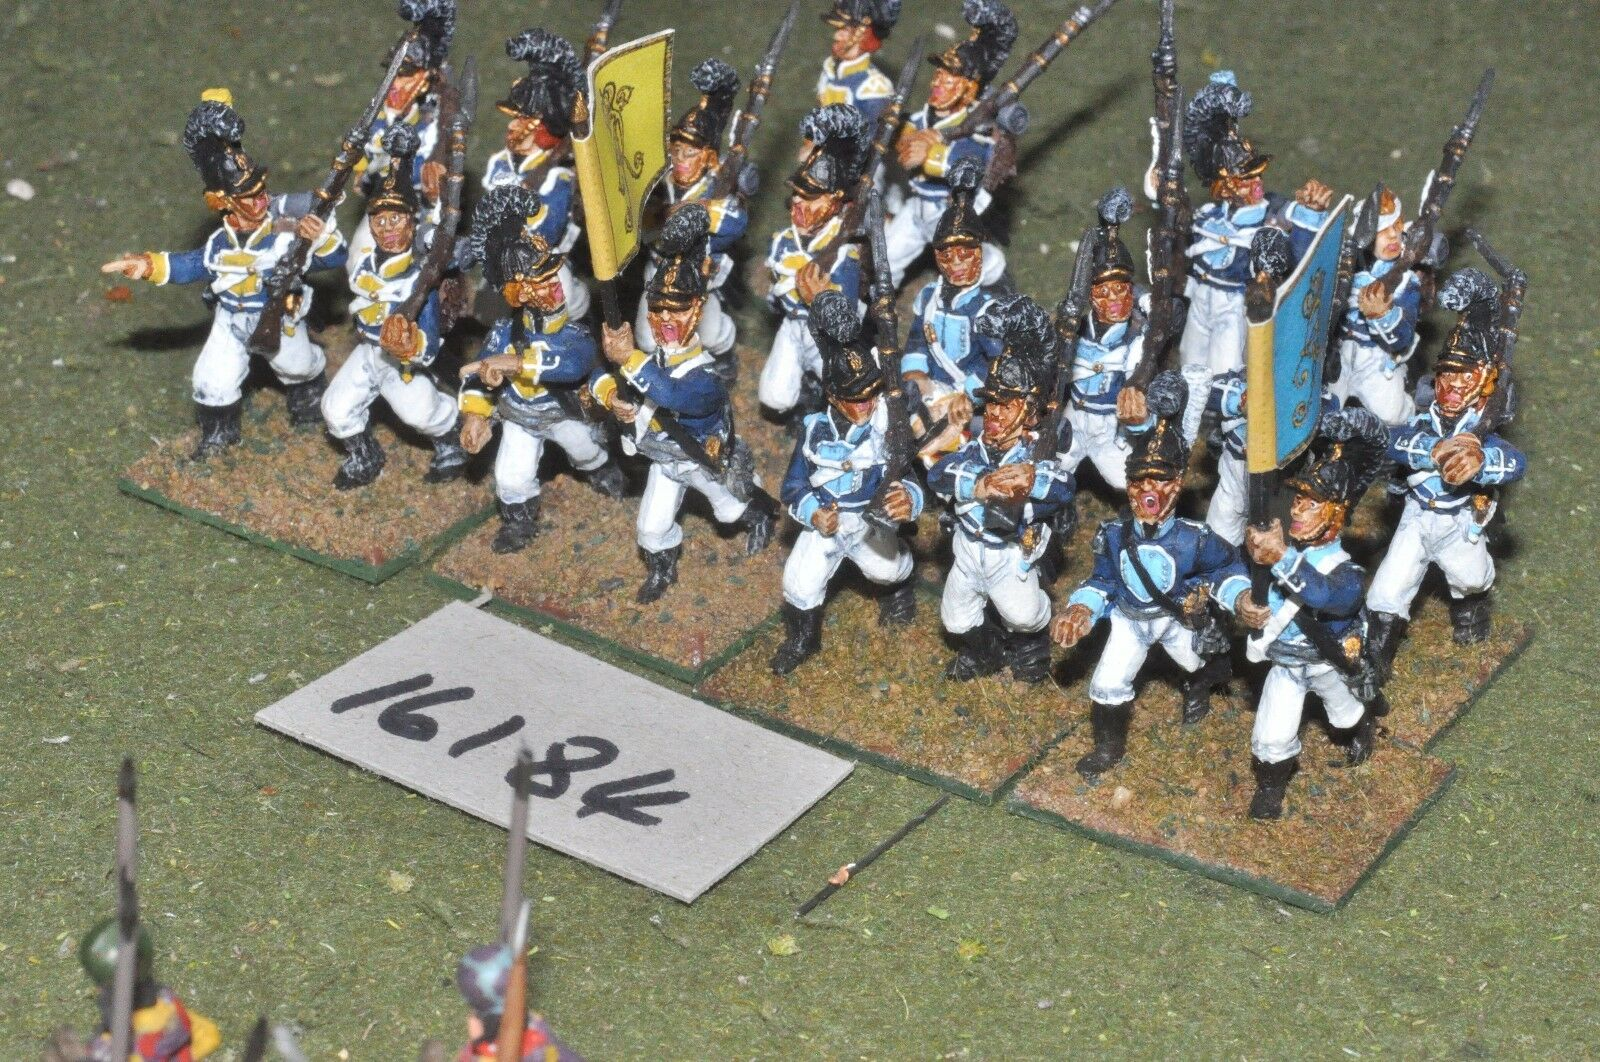 25mm Infantería Napoleónicas Wurttemberg - 20 figuras-INF (16184)